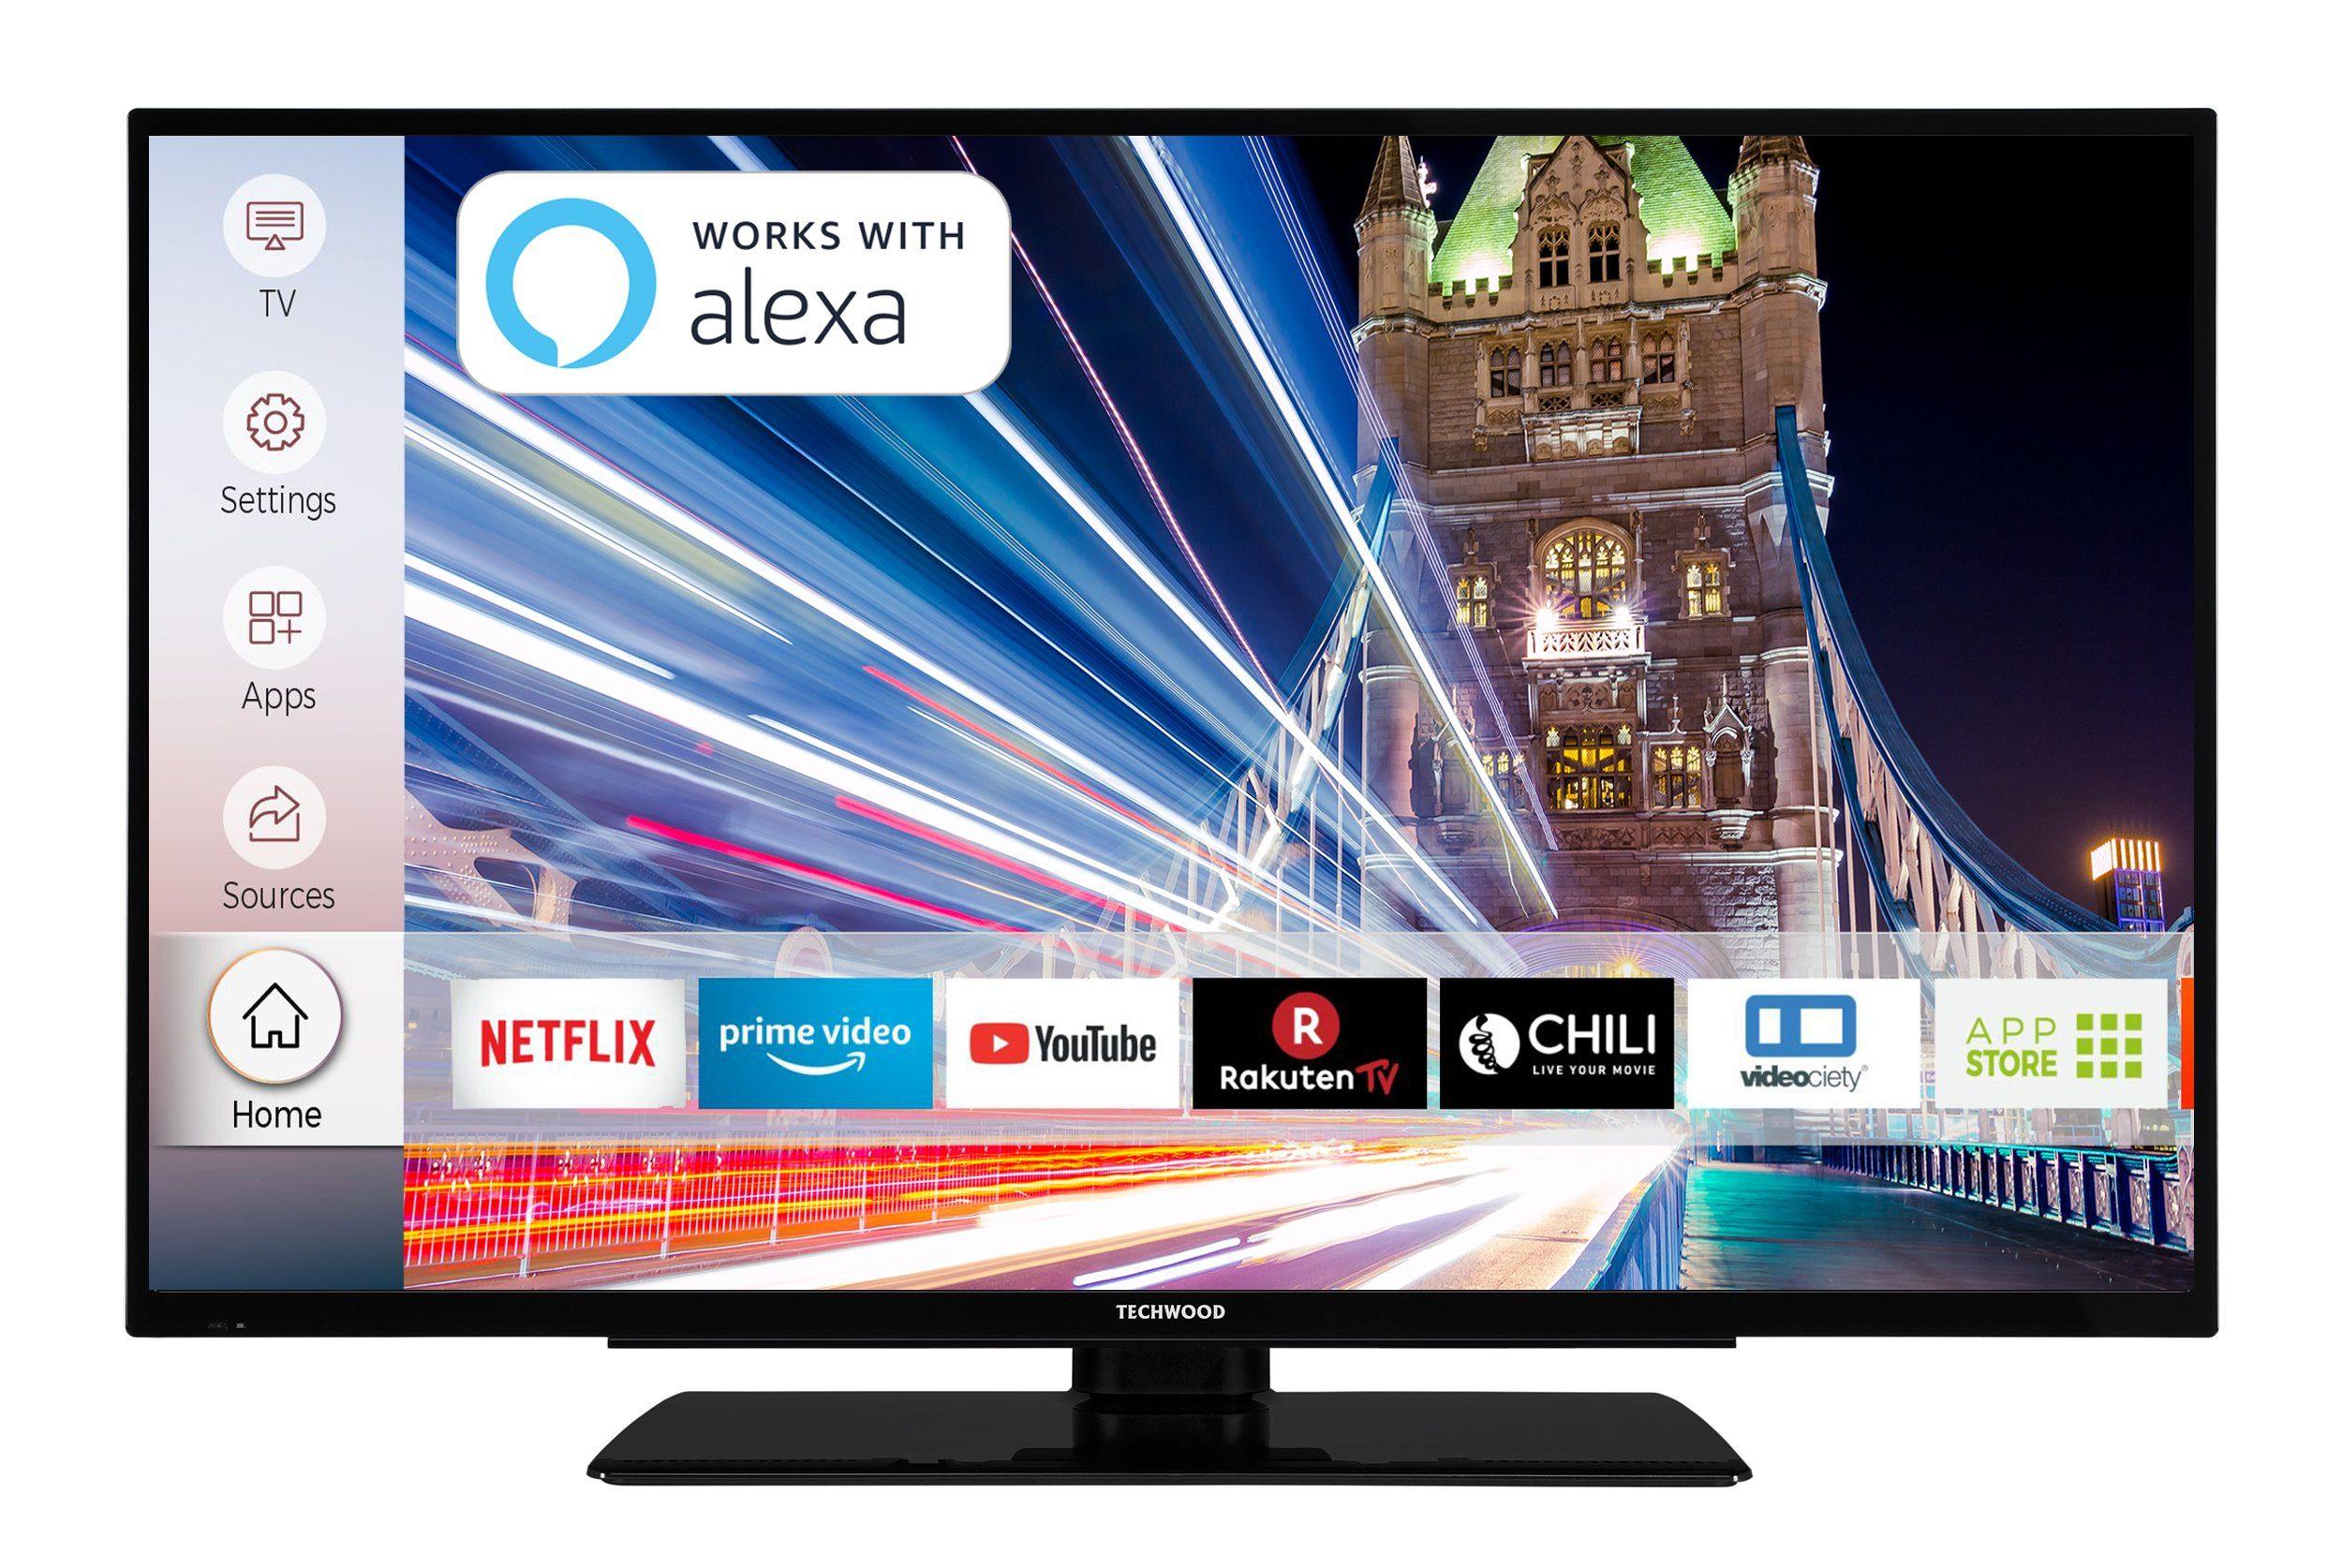 techwood 40 zoll fernseher 4k uhd smart tv triple tuner u40t52c auf raten kaufen. Black Bedroom Furniture Sets. Home Design Ideas